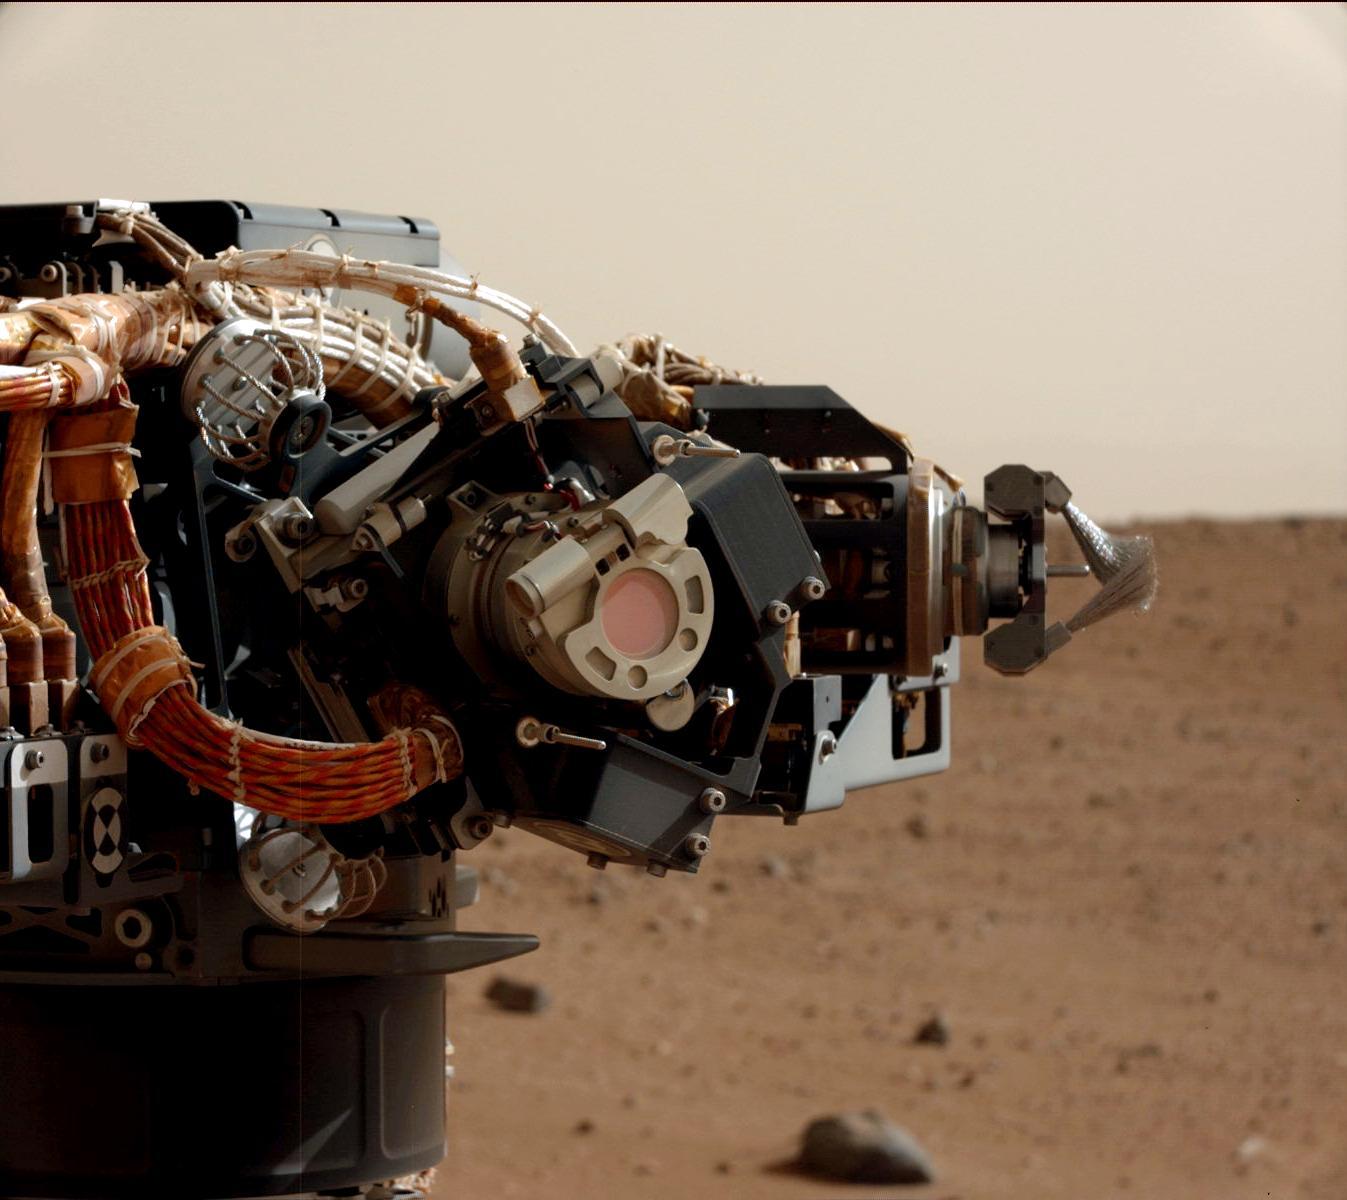 Mars rover Curiosity begins arm-work phase